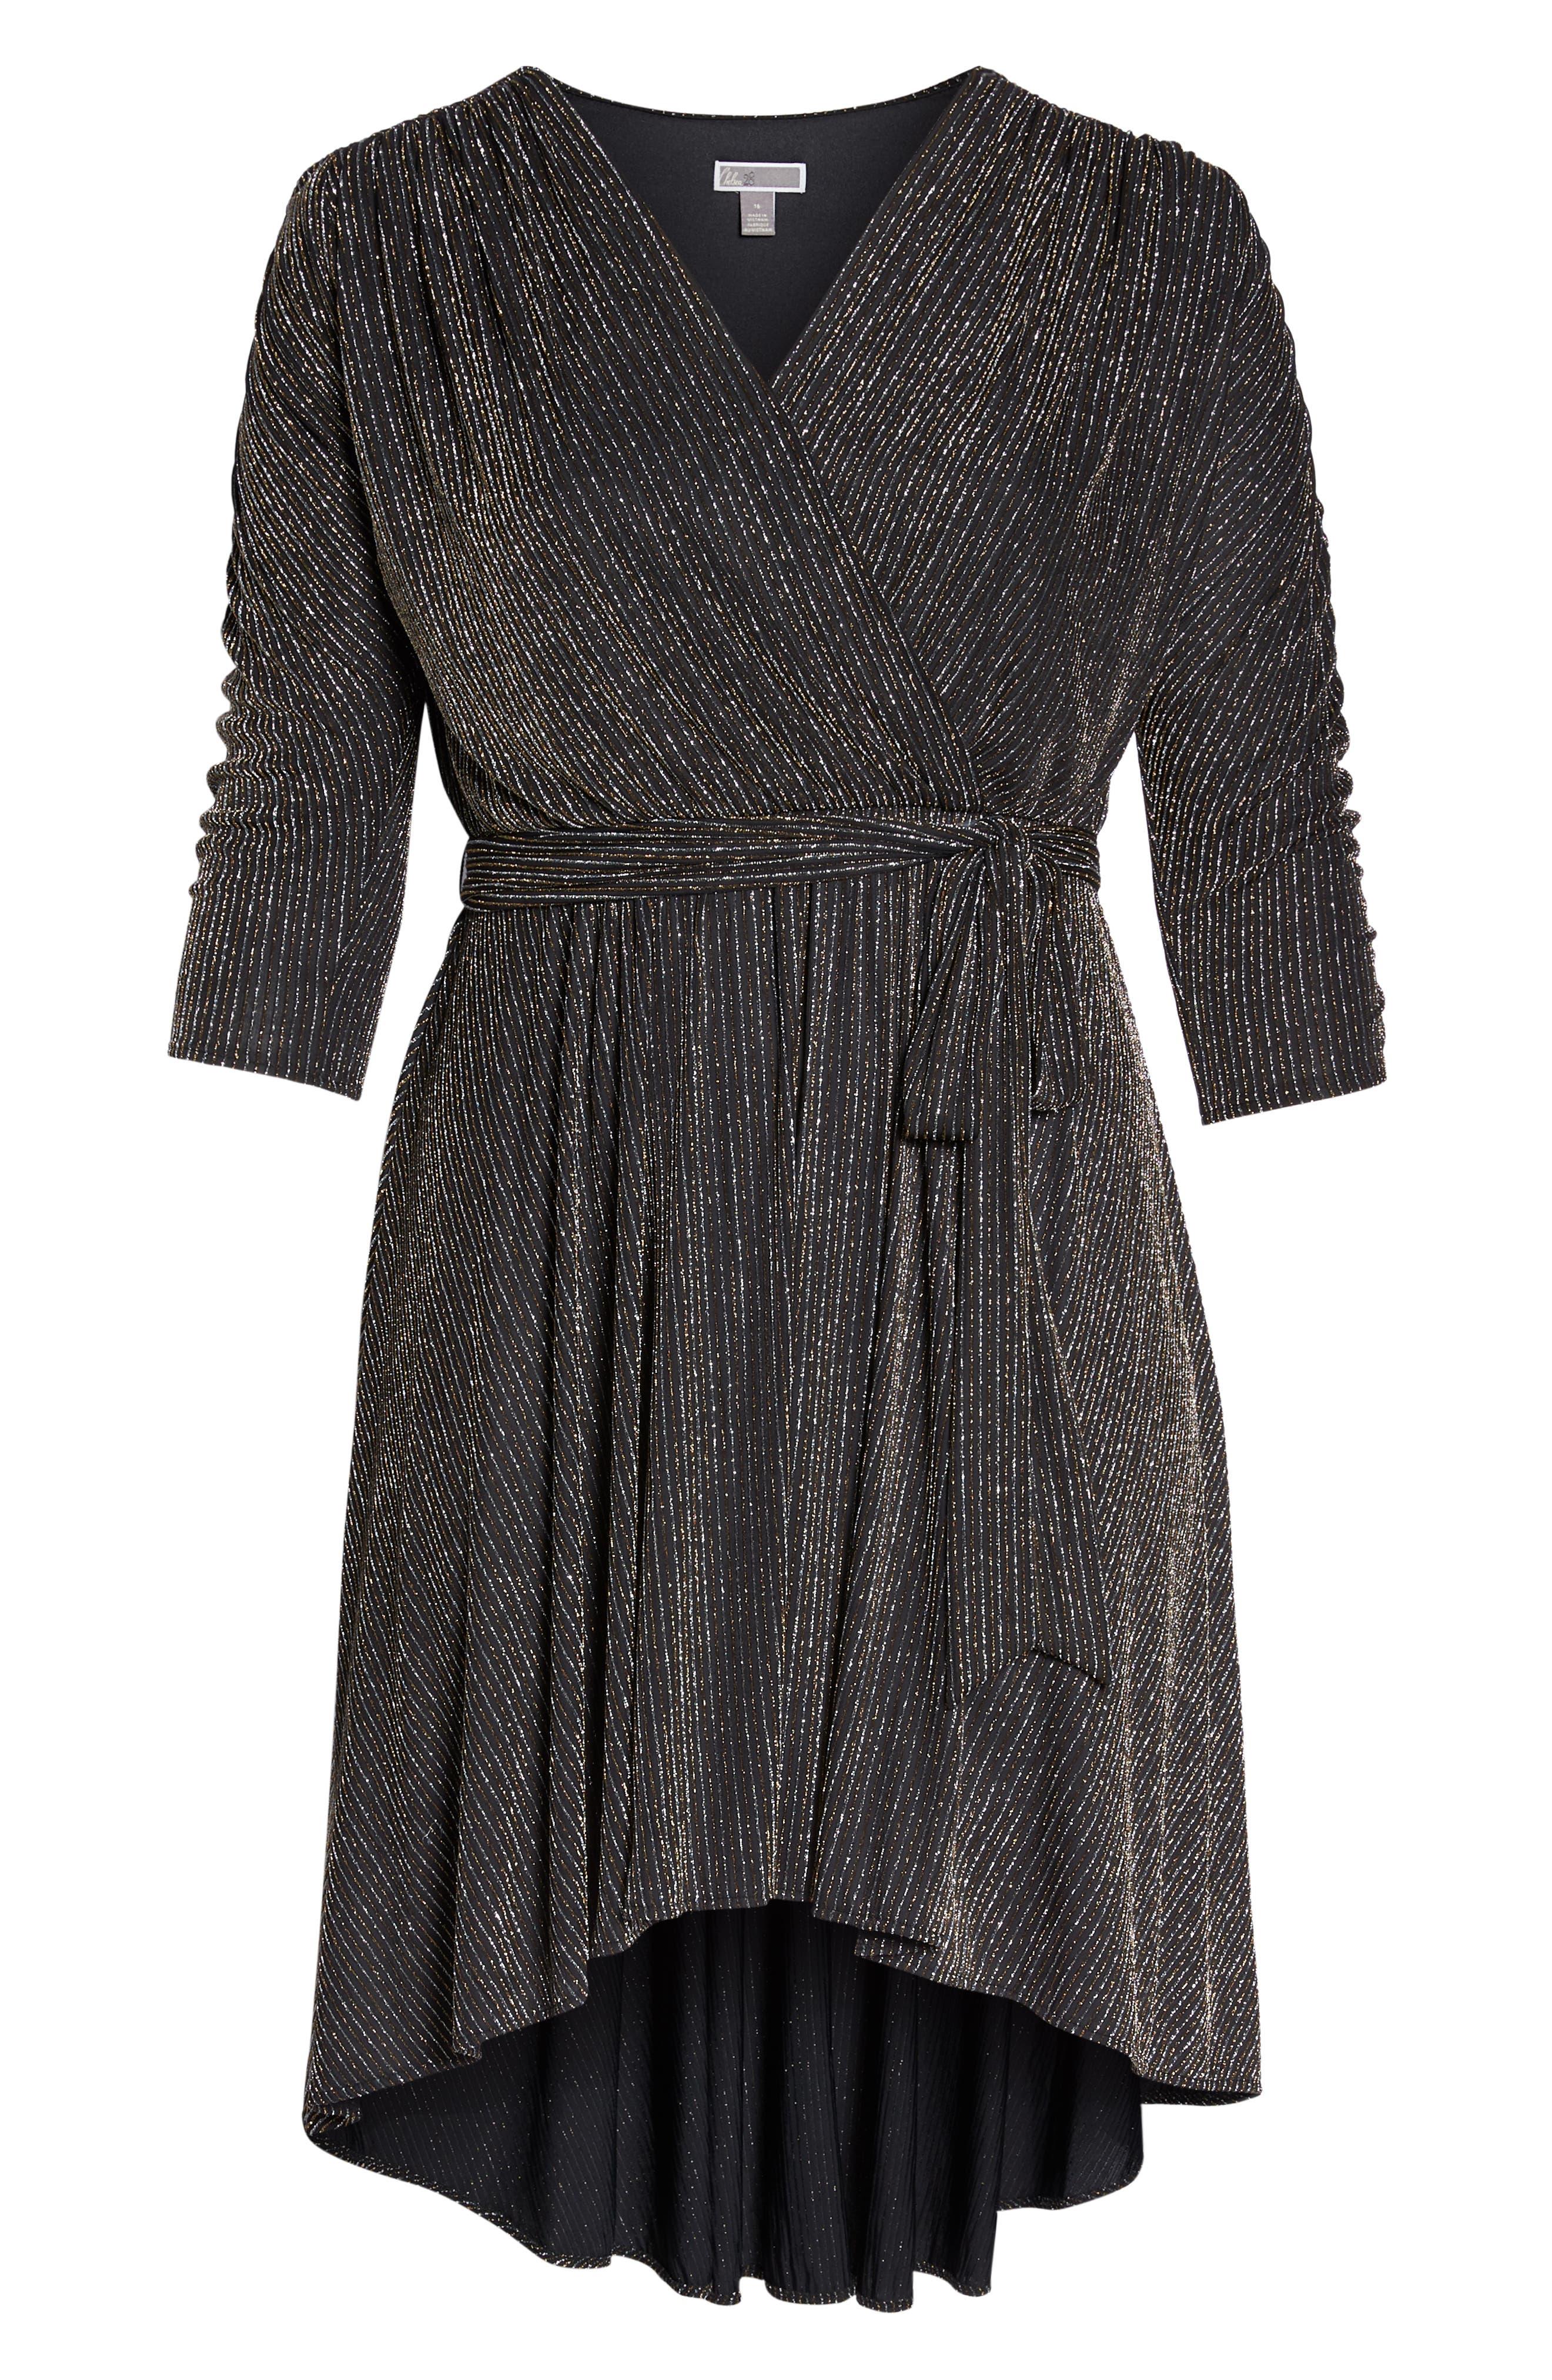 CHELSEA28,                             Metallic Tie Waist Dress,                             Alternate thumbnail 6, color,                             001